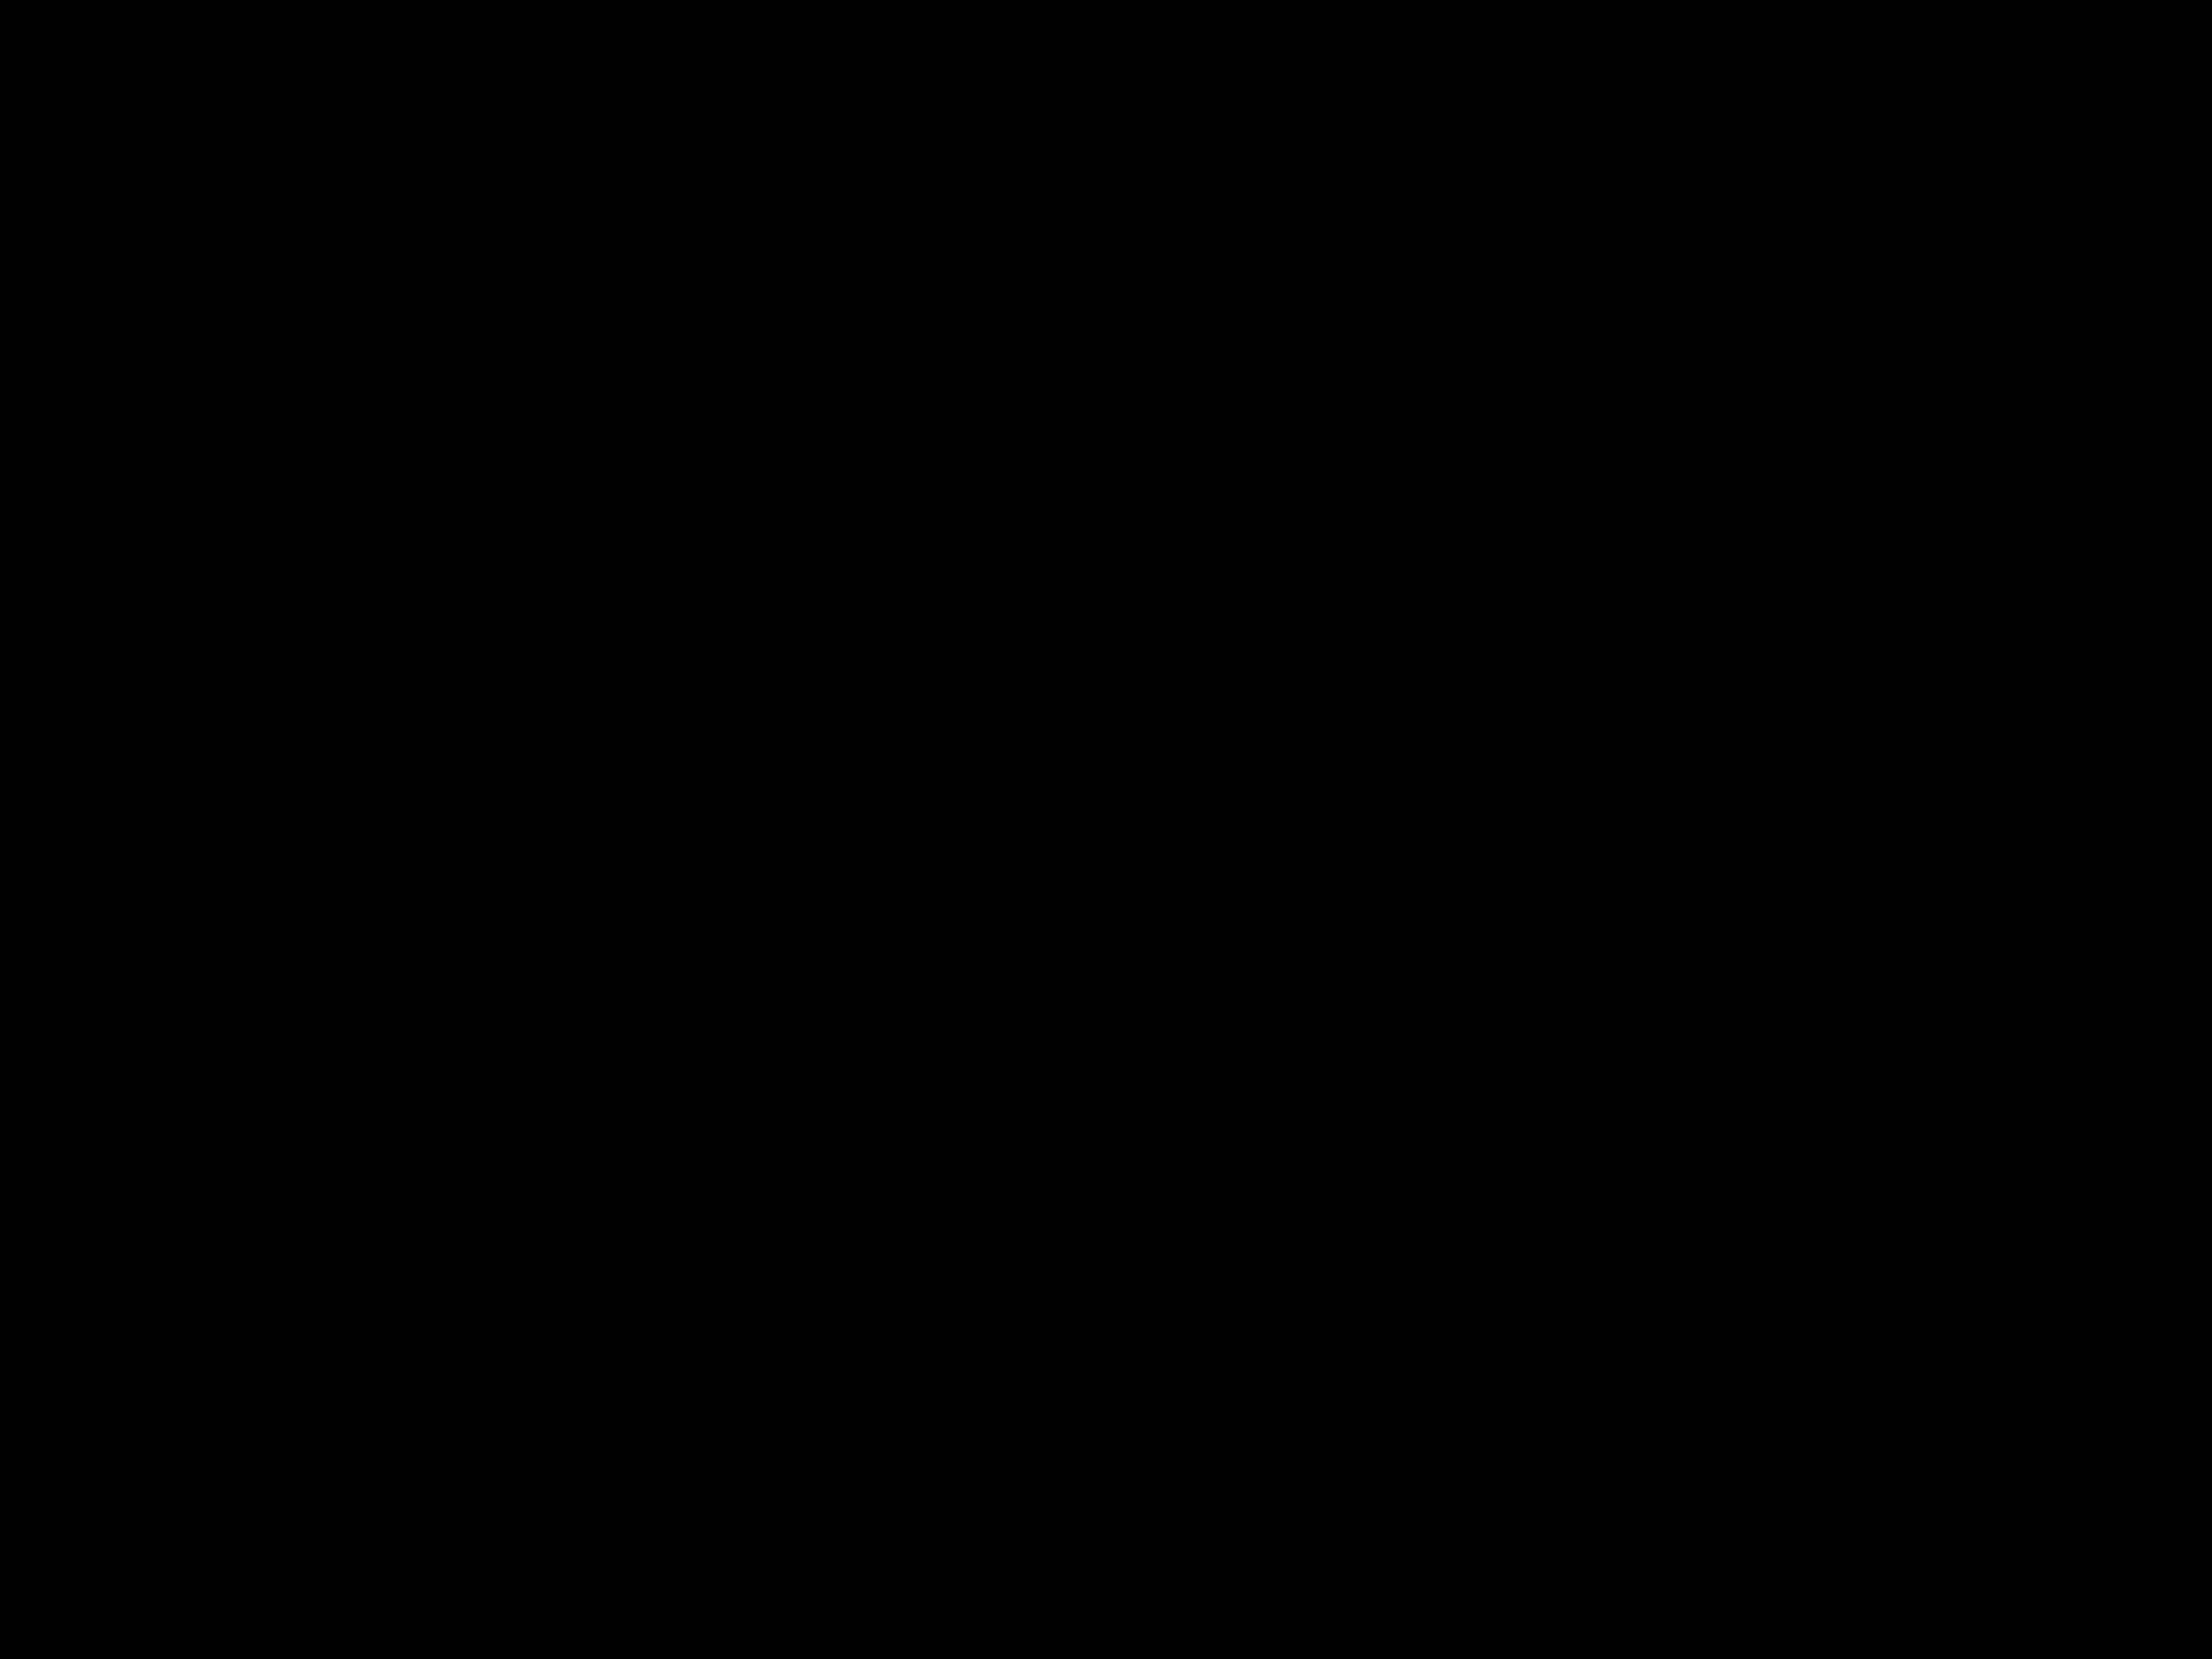 Vibrocultor Halcon 29 Braços